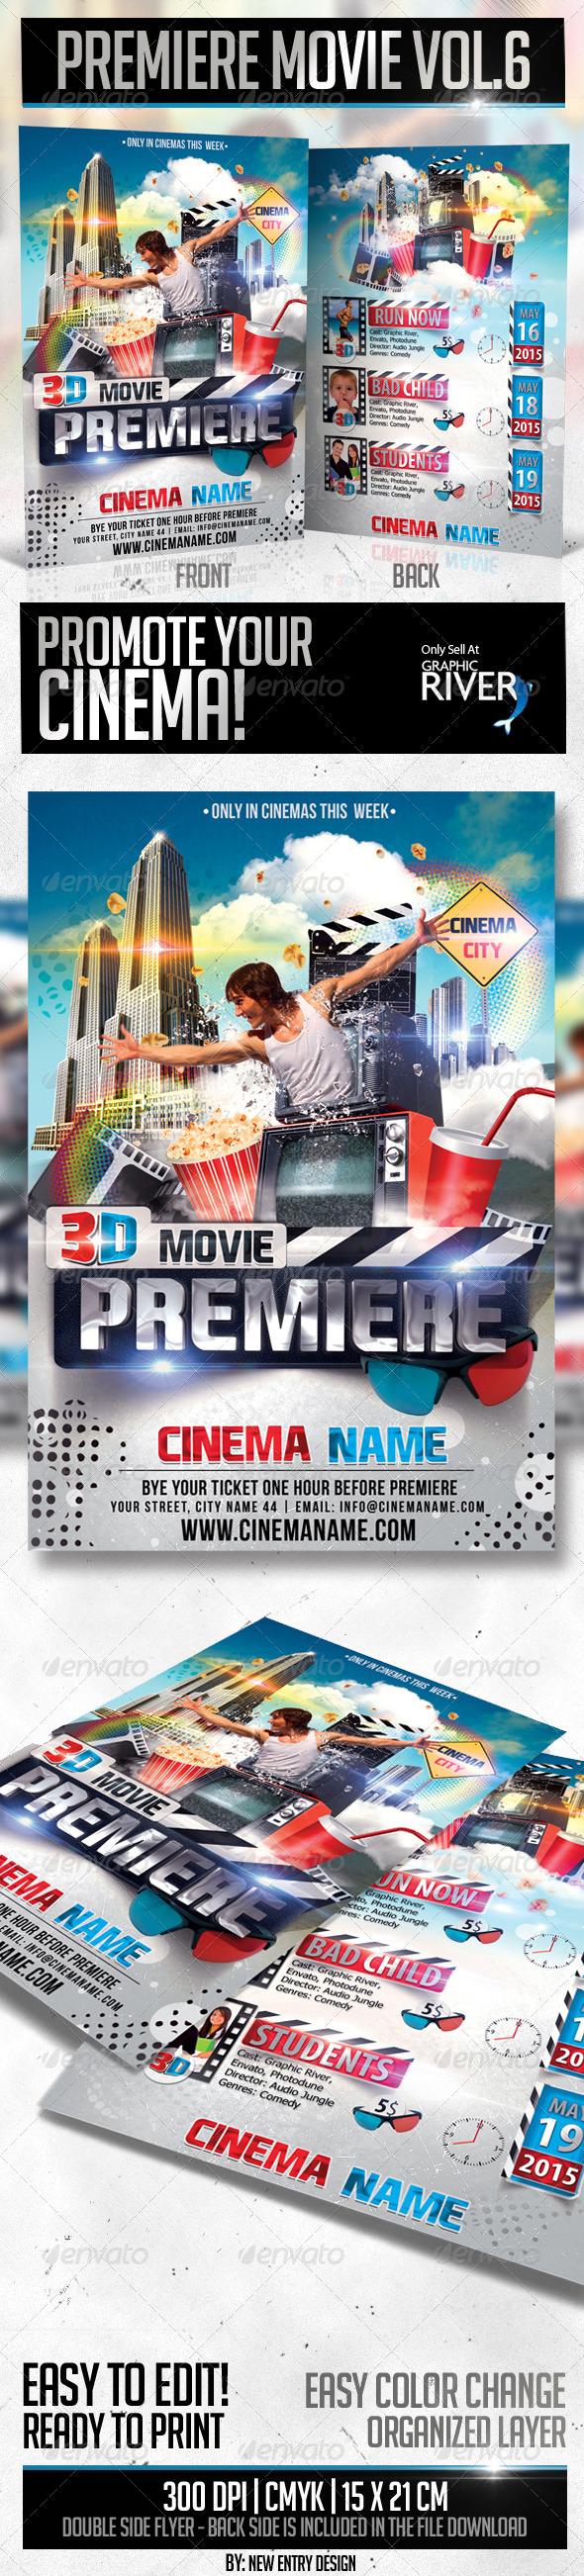 Premiere Movie Vol6 - Miscellaneous Events